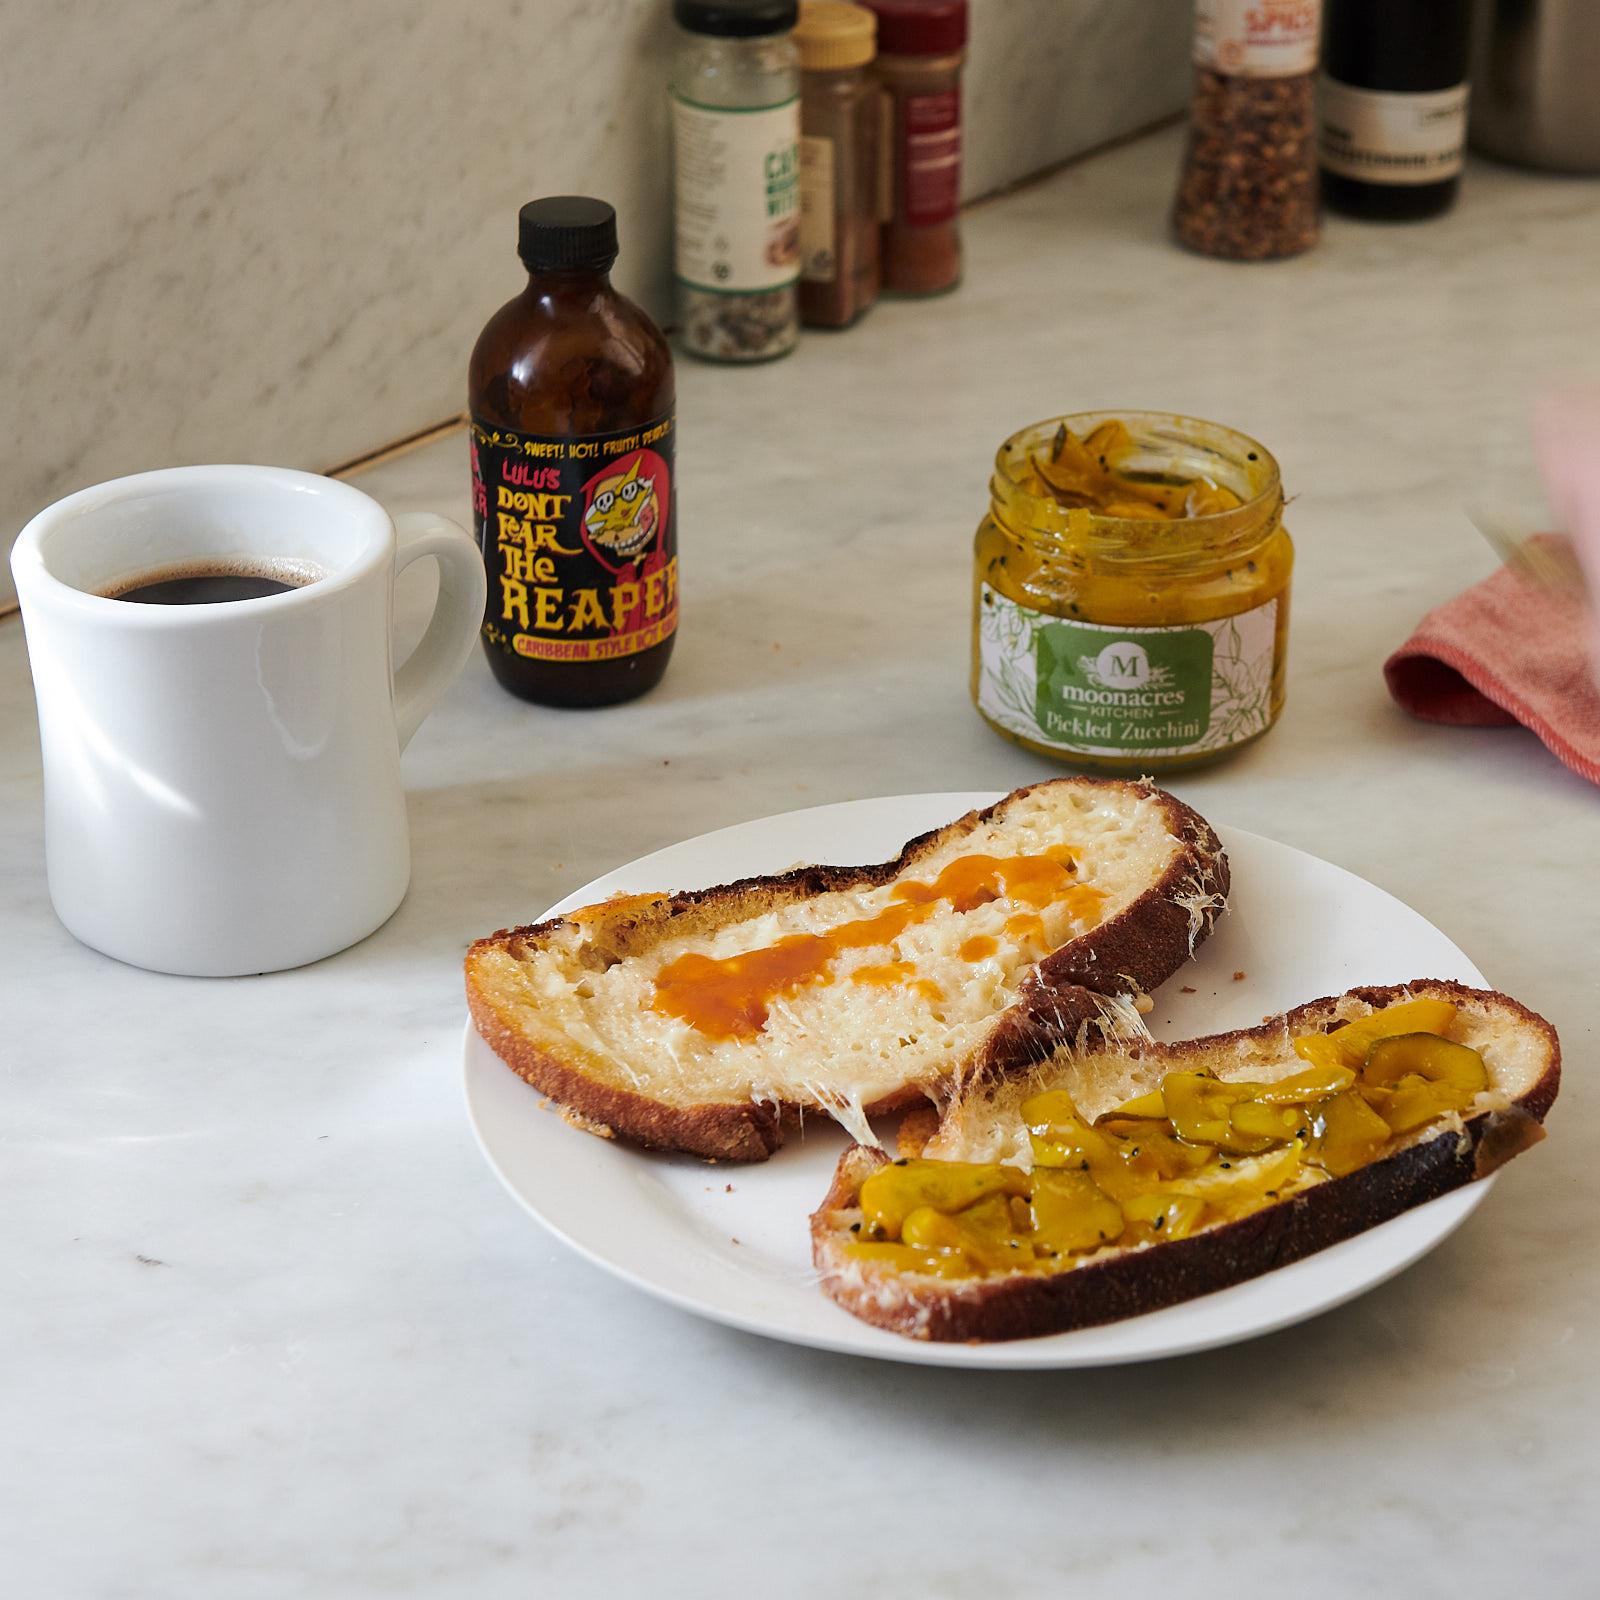 Sourdough, Heidi Farm Tilsit, Lulu's hot sauce and Moonacres Pickled Zucchini. Butter. Oil. Butter. Tick.